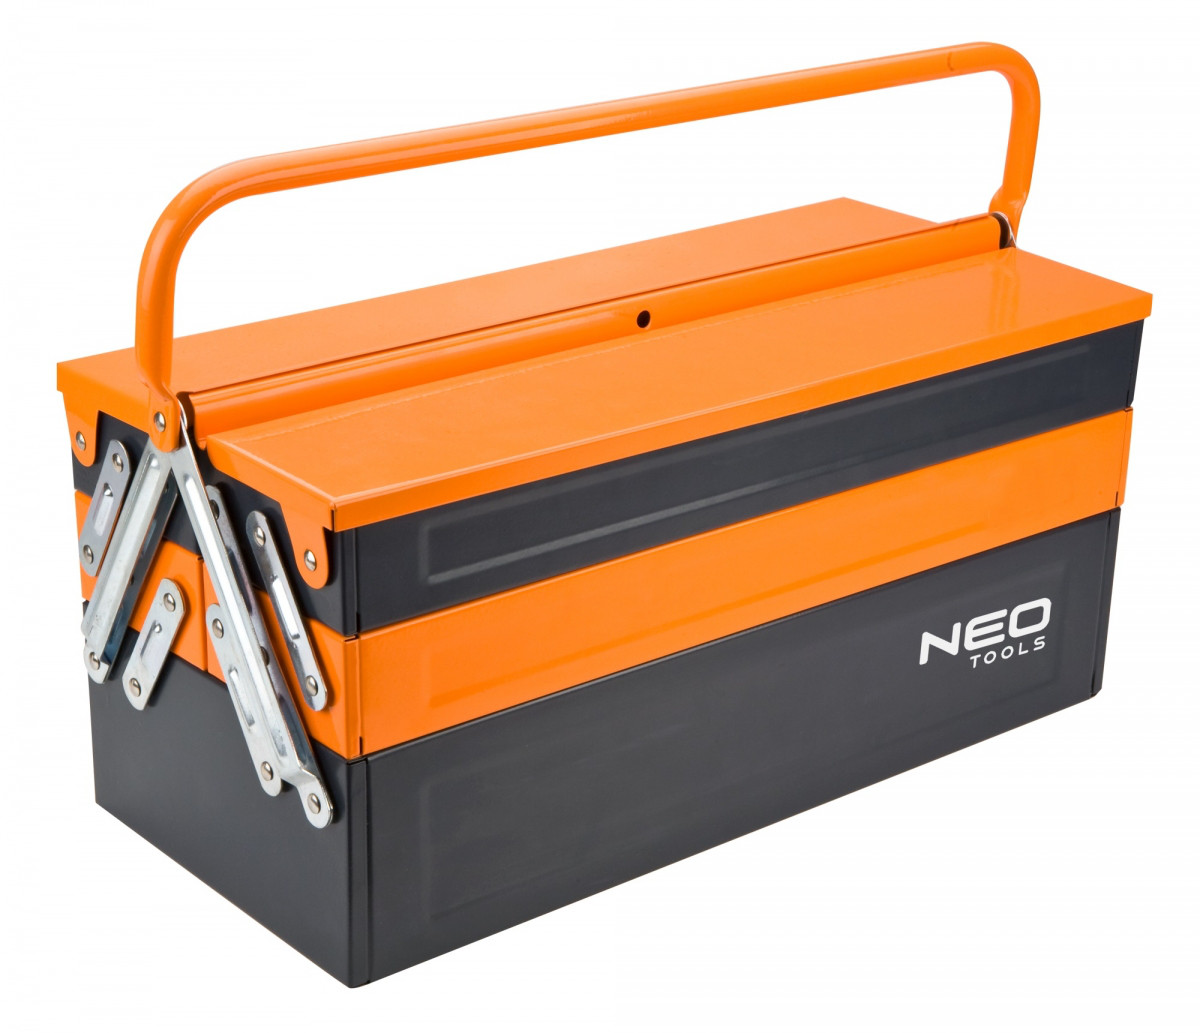 Neo Tools 84-100 Ящик для инструмента, металлический, 455 мм